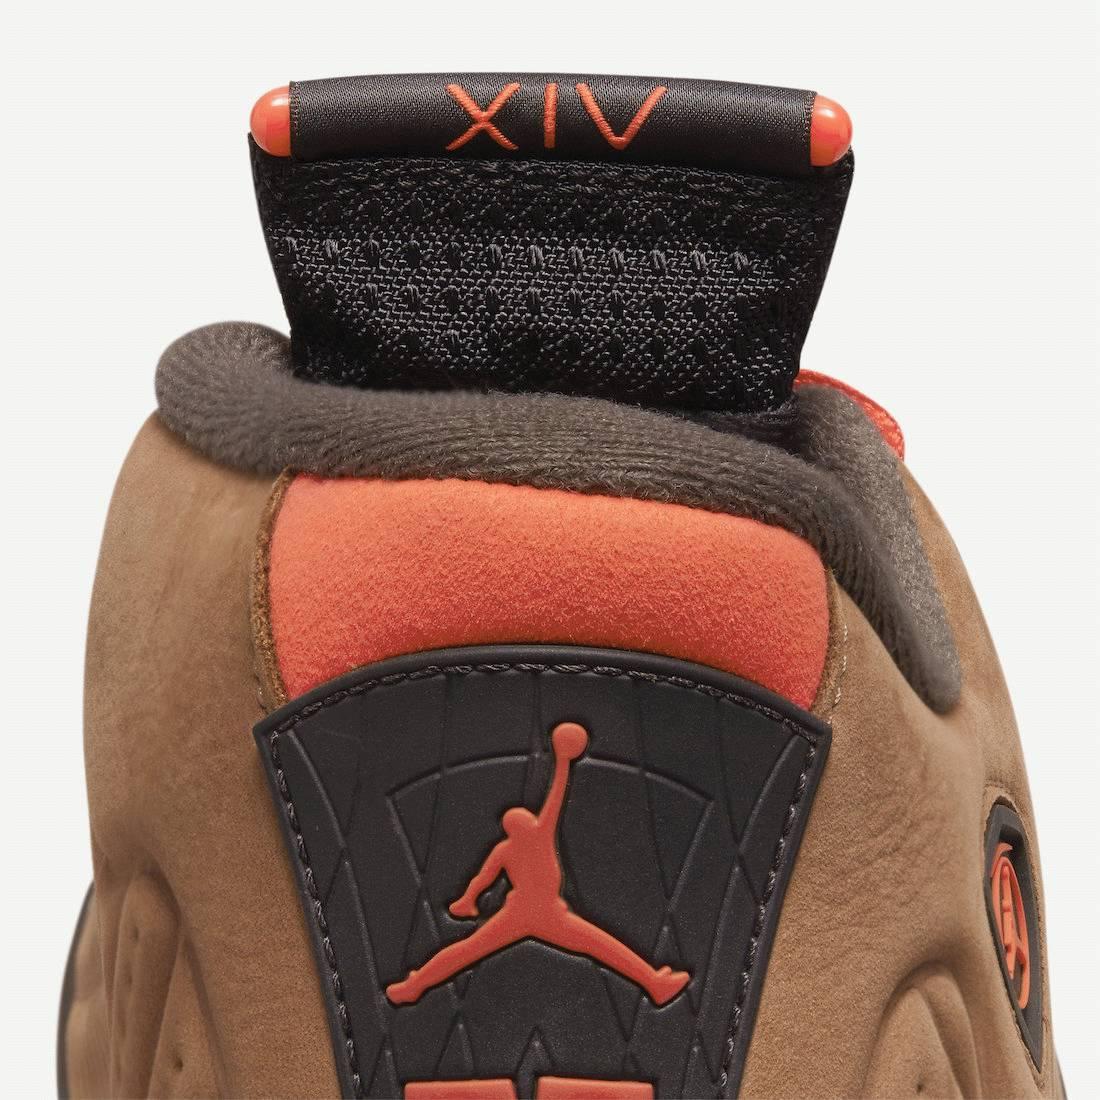 Winterized Air Jordan 14 sneaker